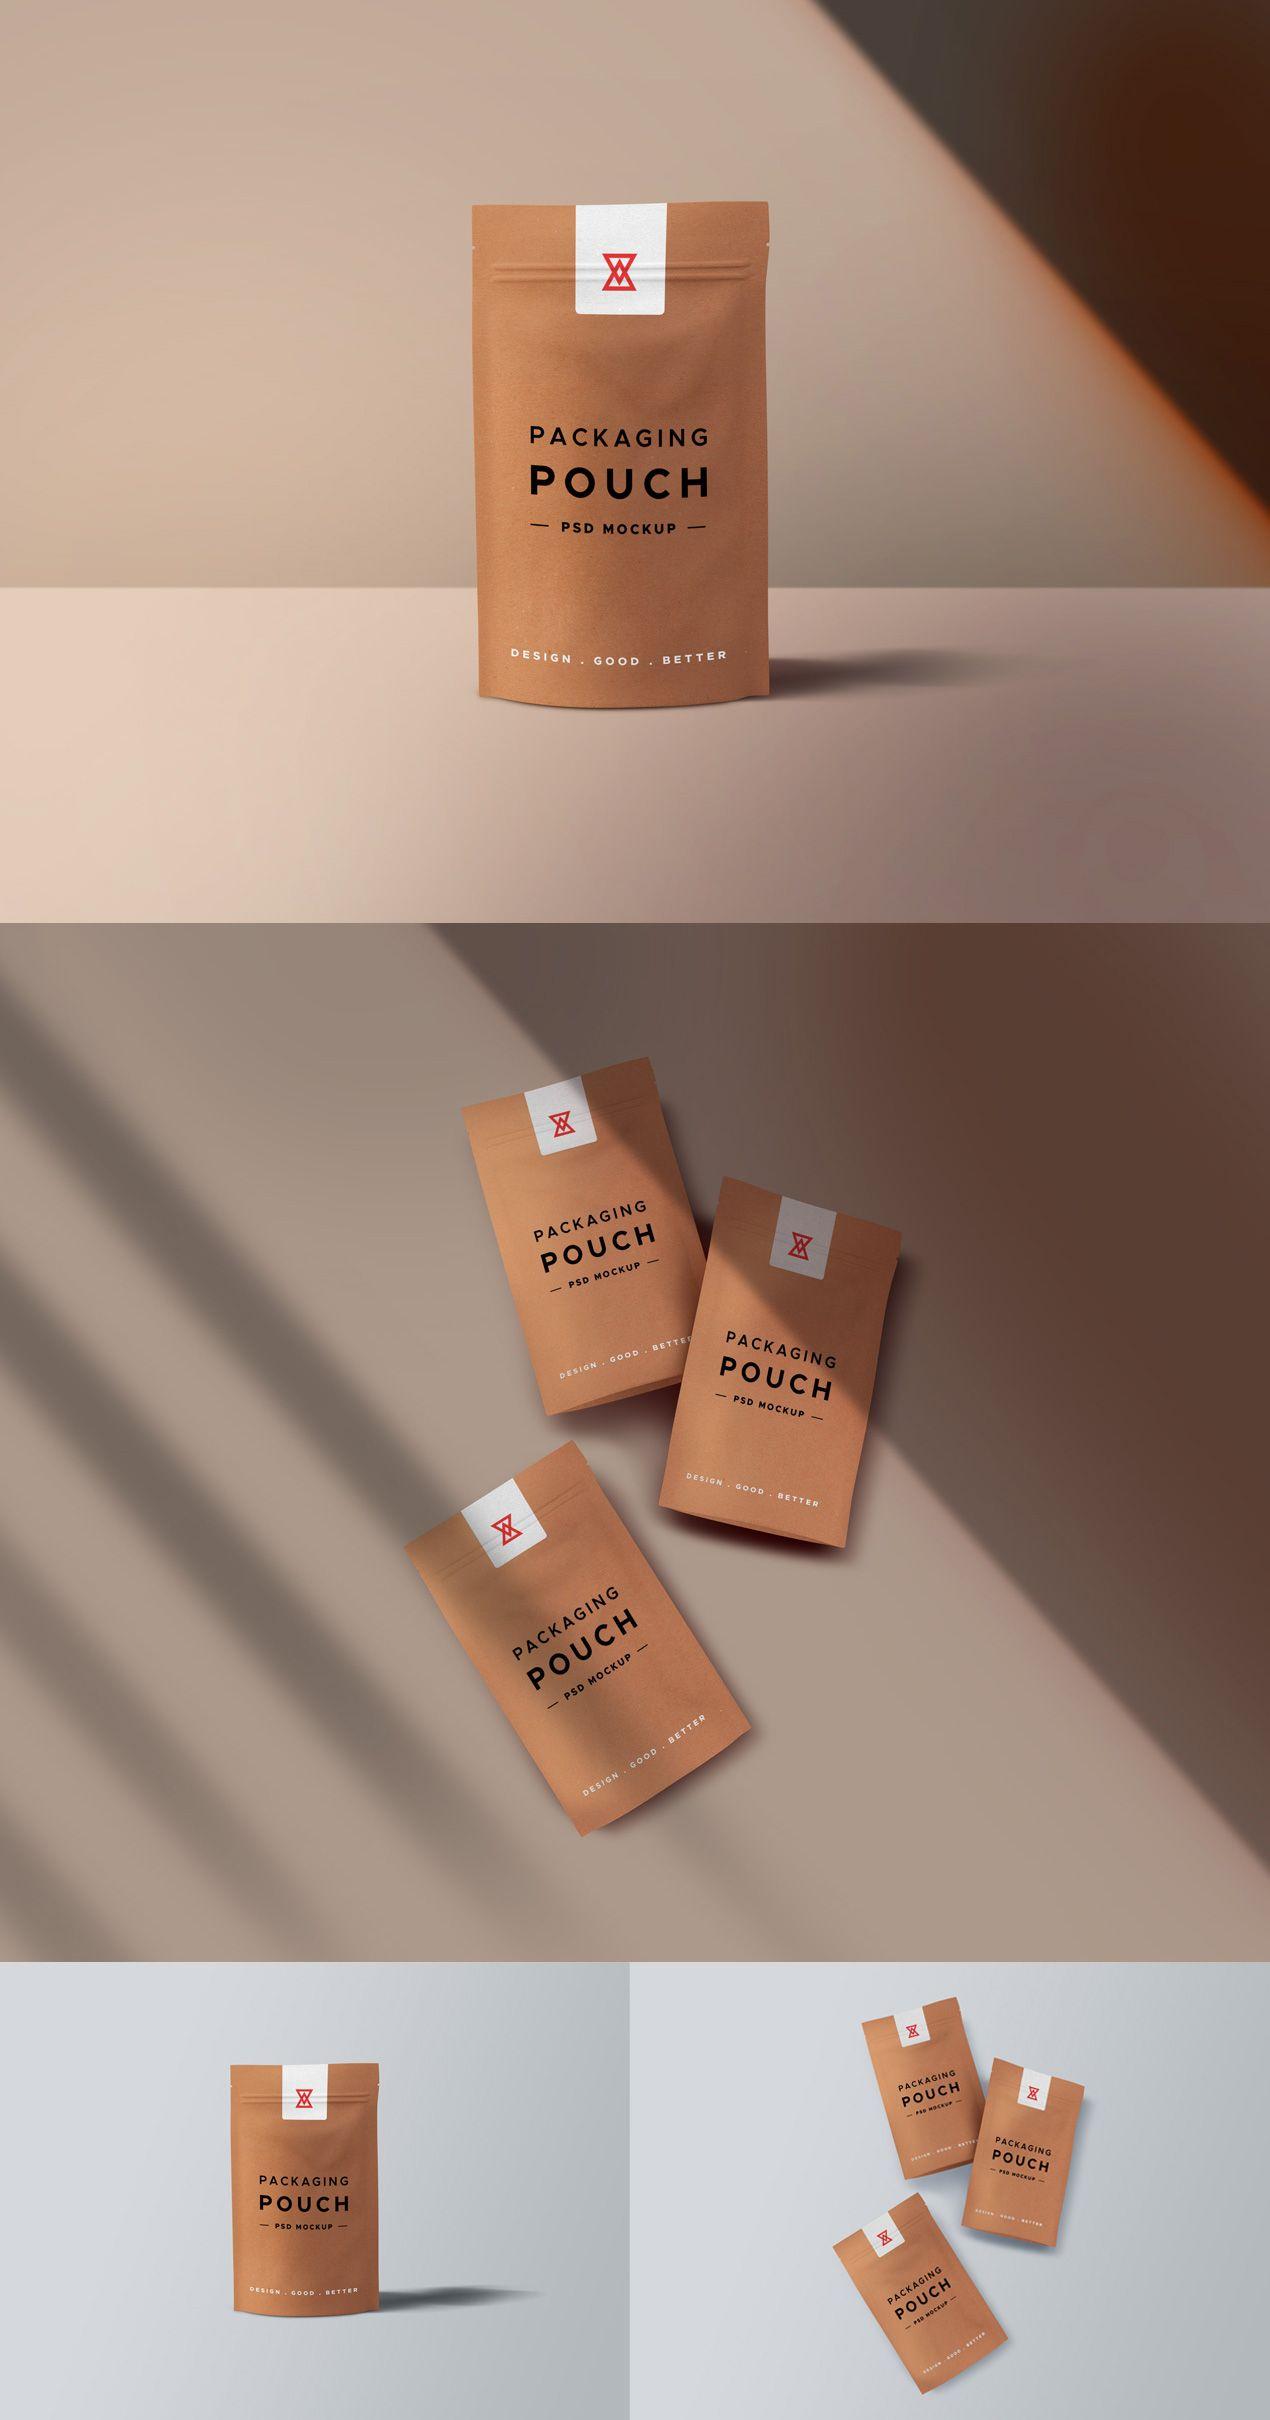 Download Paper Pouch Packaging Mockups Set Graphicsfuel Pouch Packaging Paper Pouch Packaging Labels Design